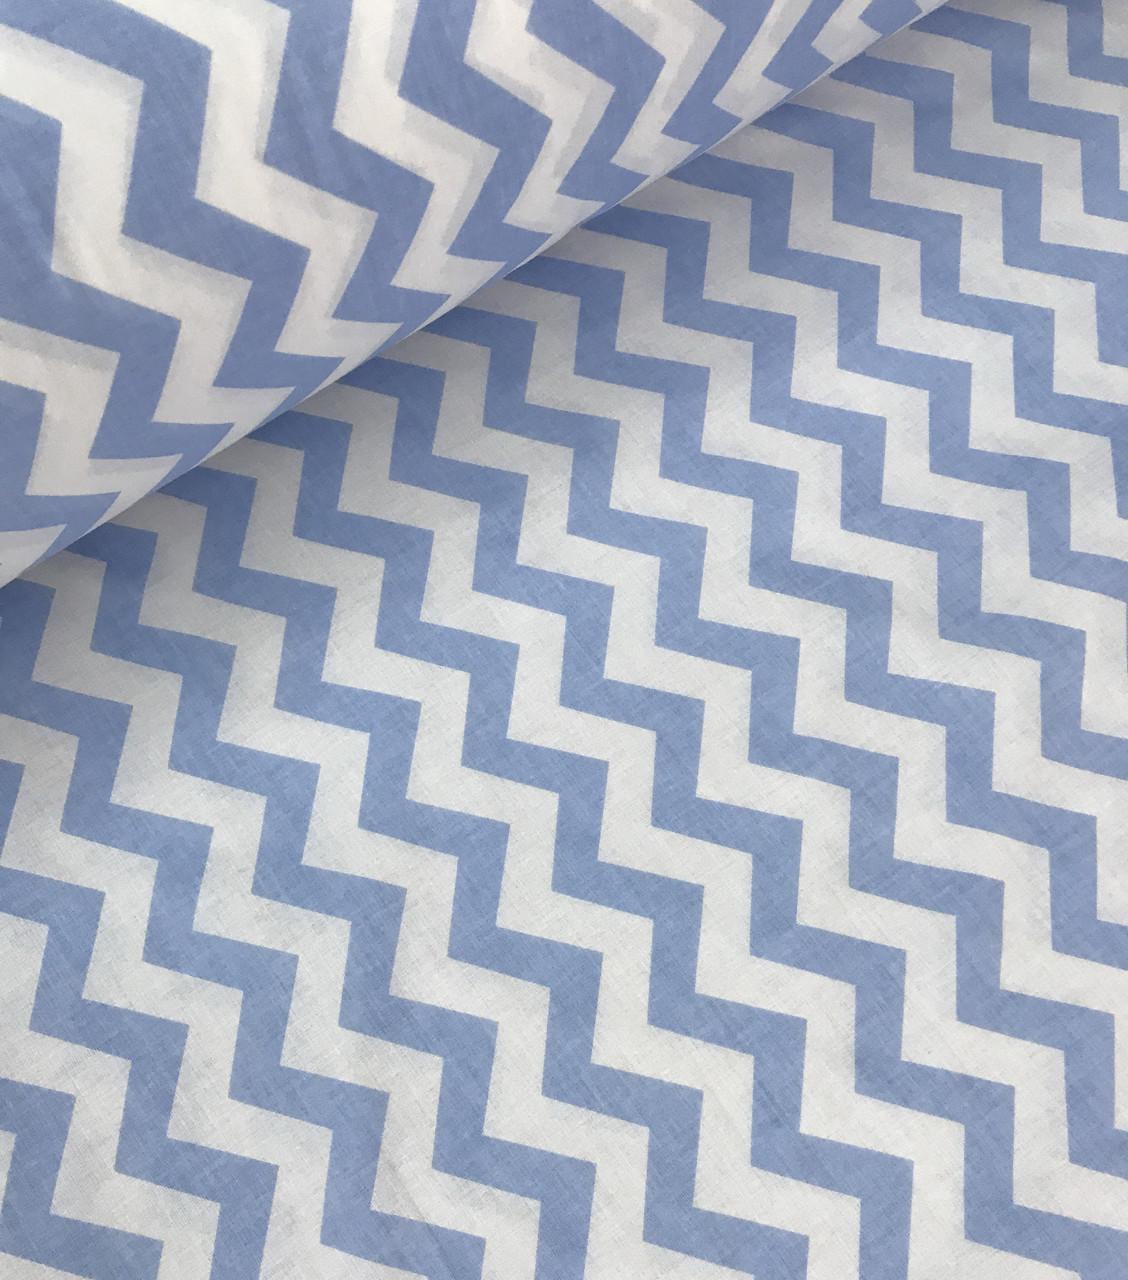 Хлопковая ткань зигзаг светло-голубой